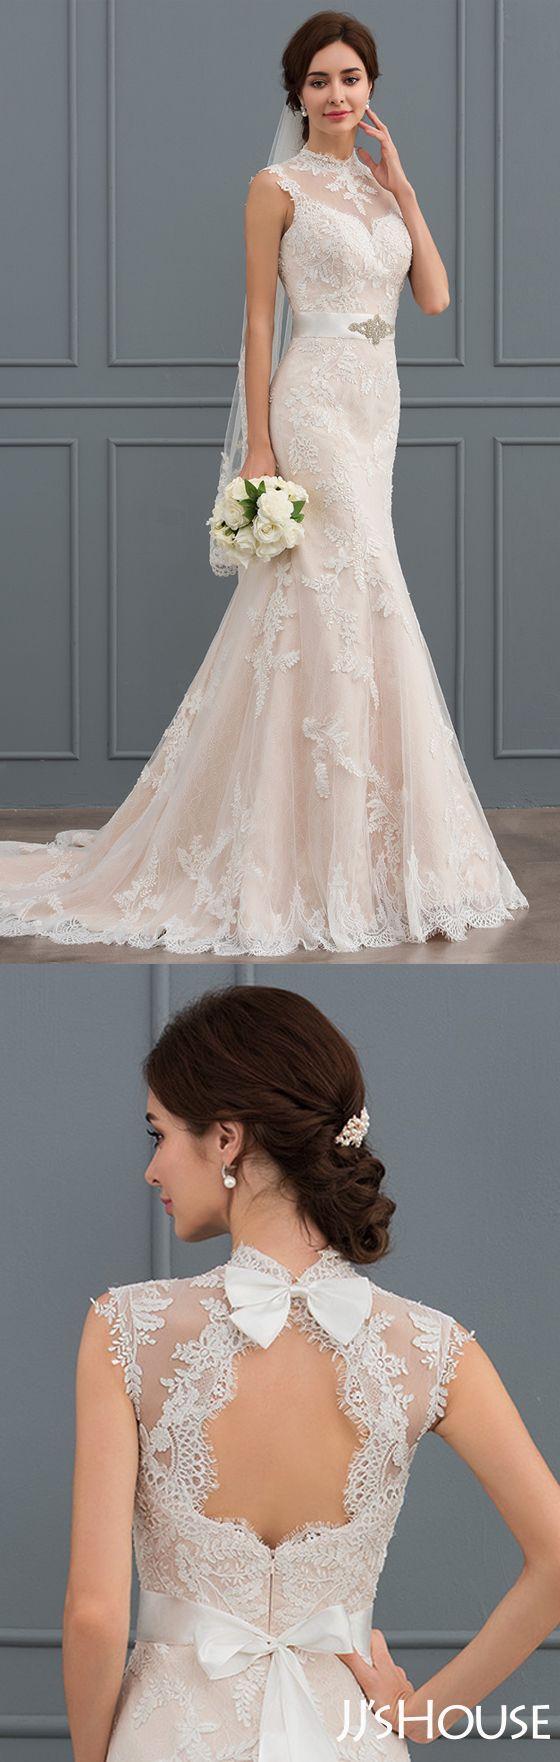 Such an amazing high-neck mermaid wedding dress! #JJsHouse #Wedding